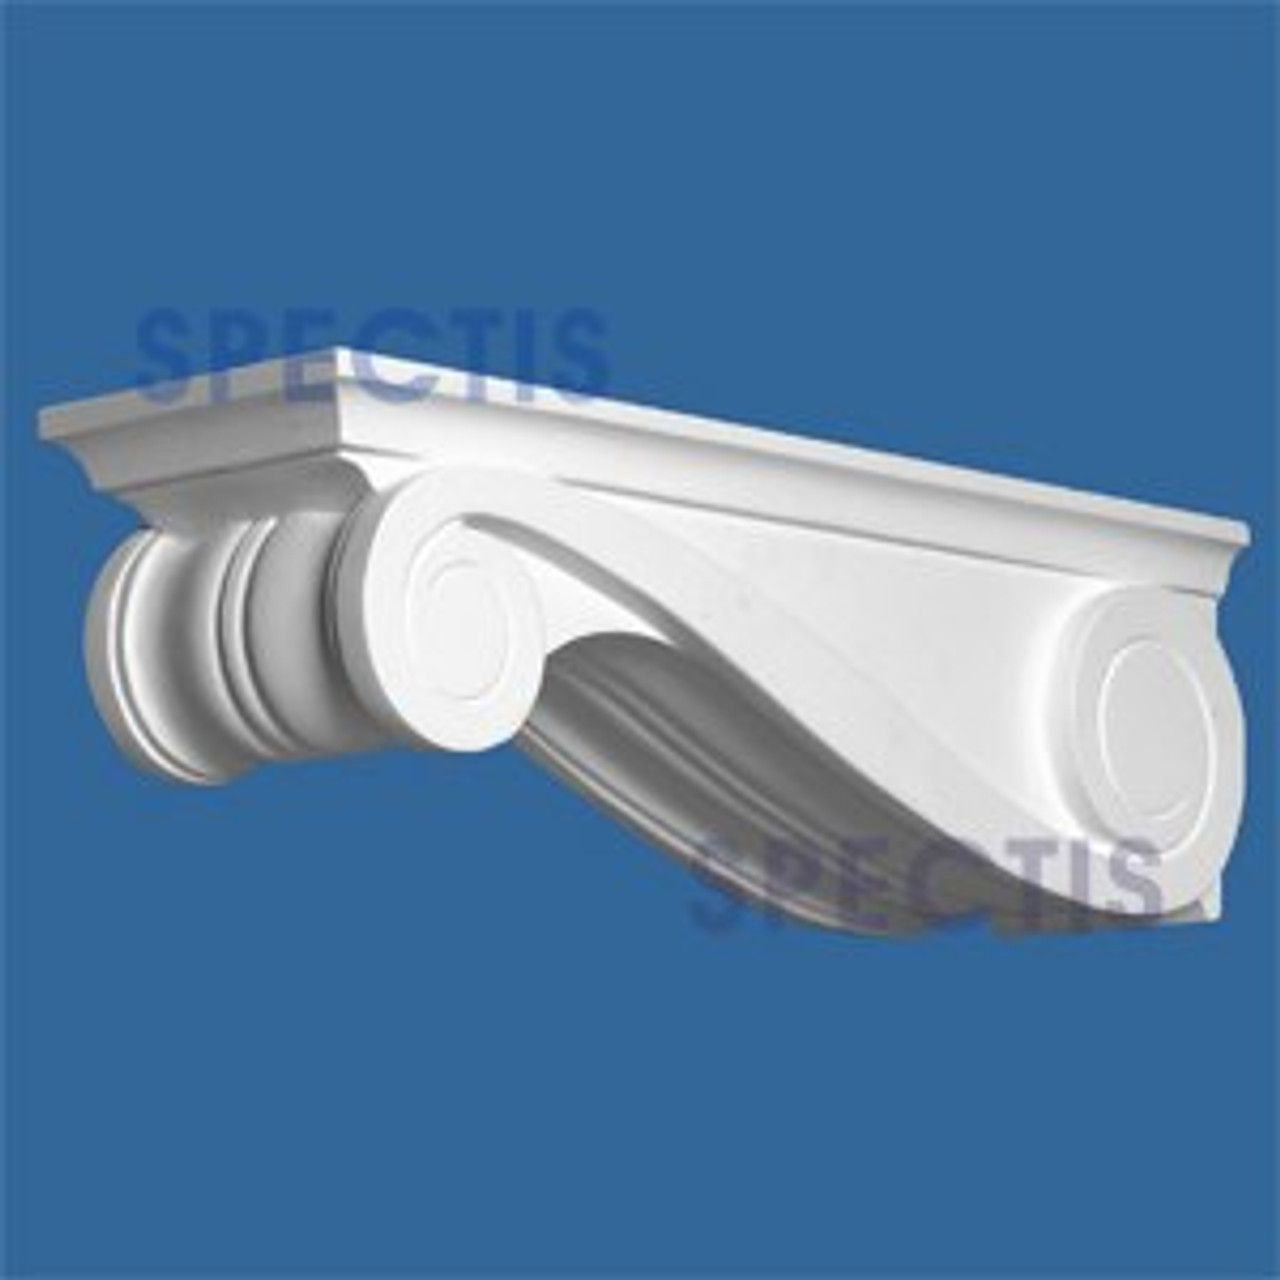 "BL2597 Corbel Block or Eave Bracket 6.27""W x 7""H x 22.25"" P"